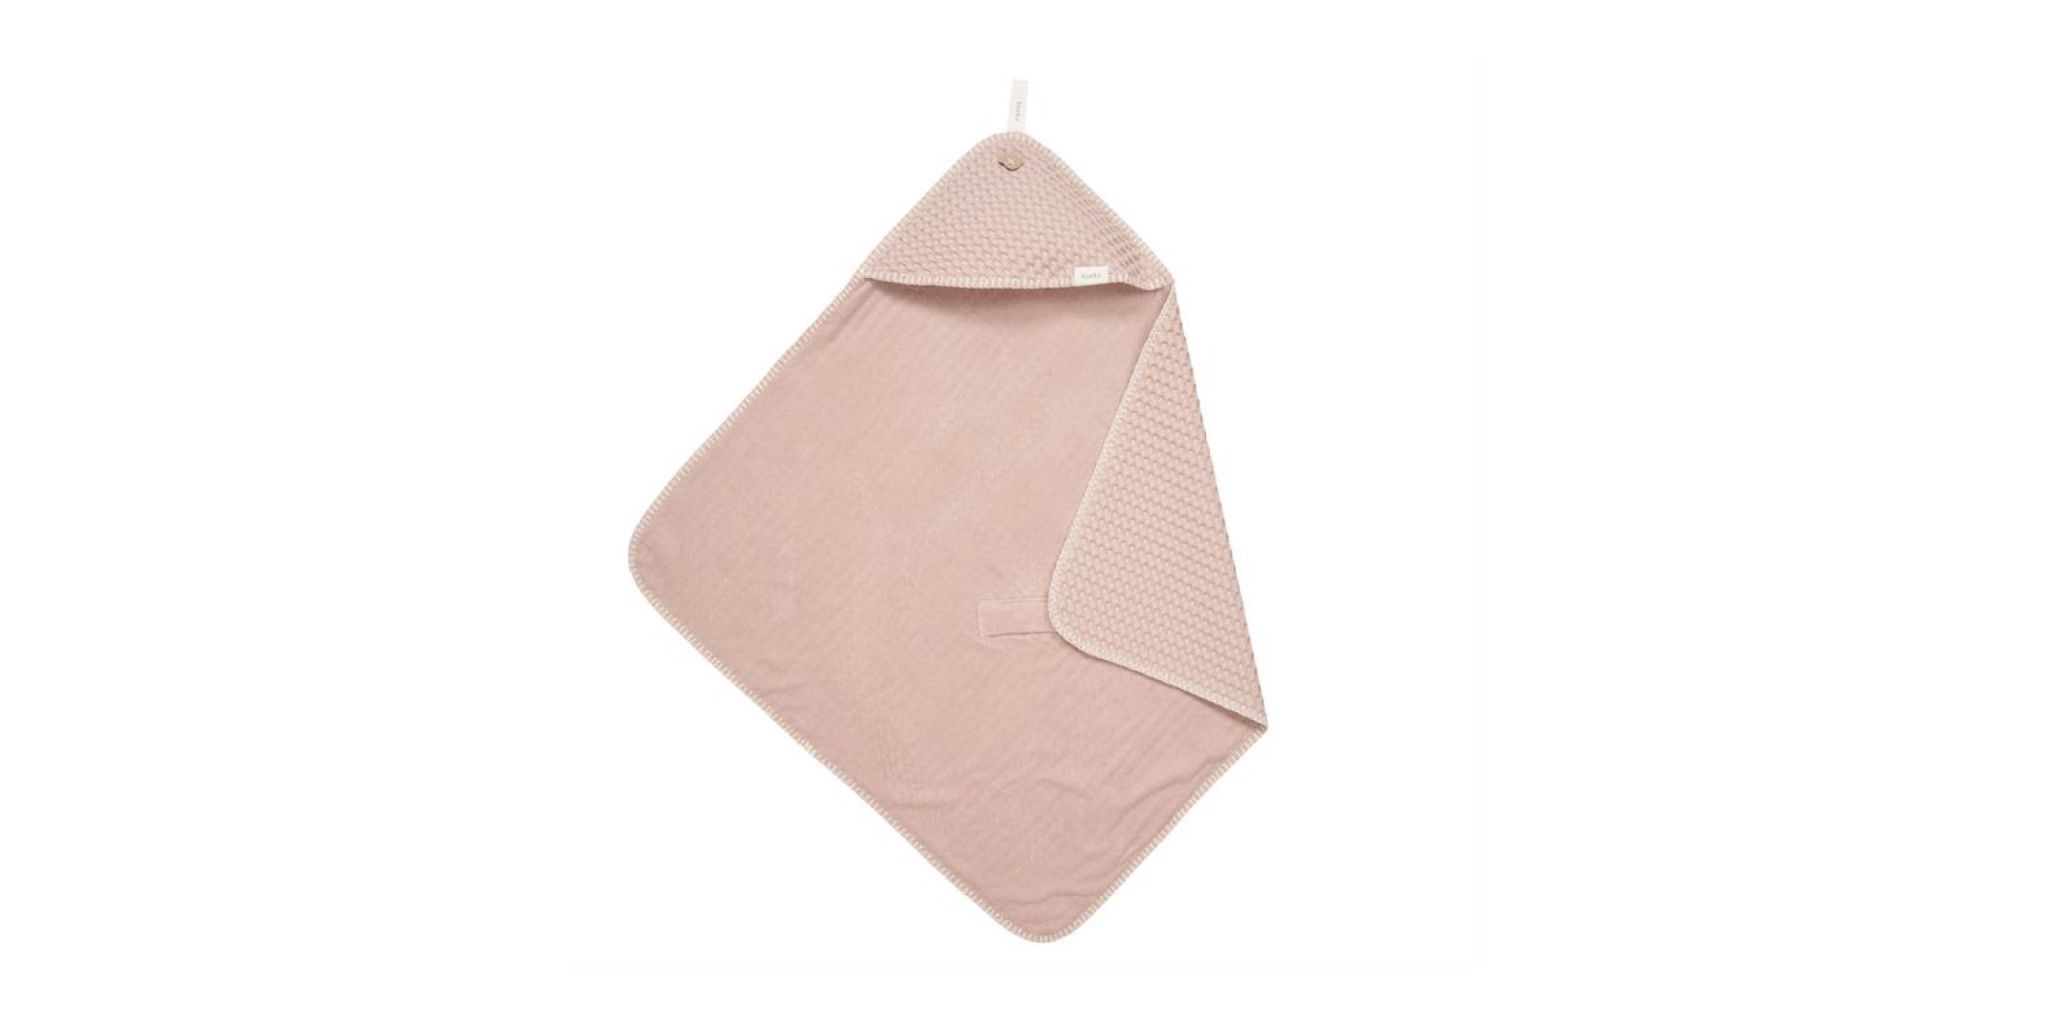 Koeka Koeka Antwerp wikkelcape grey pink 422